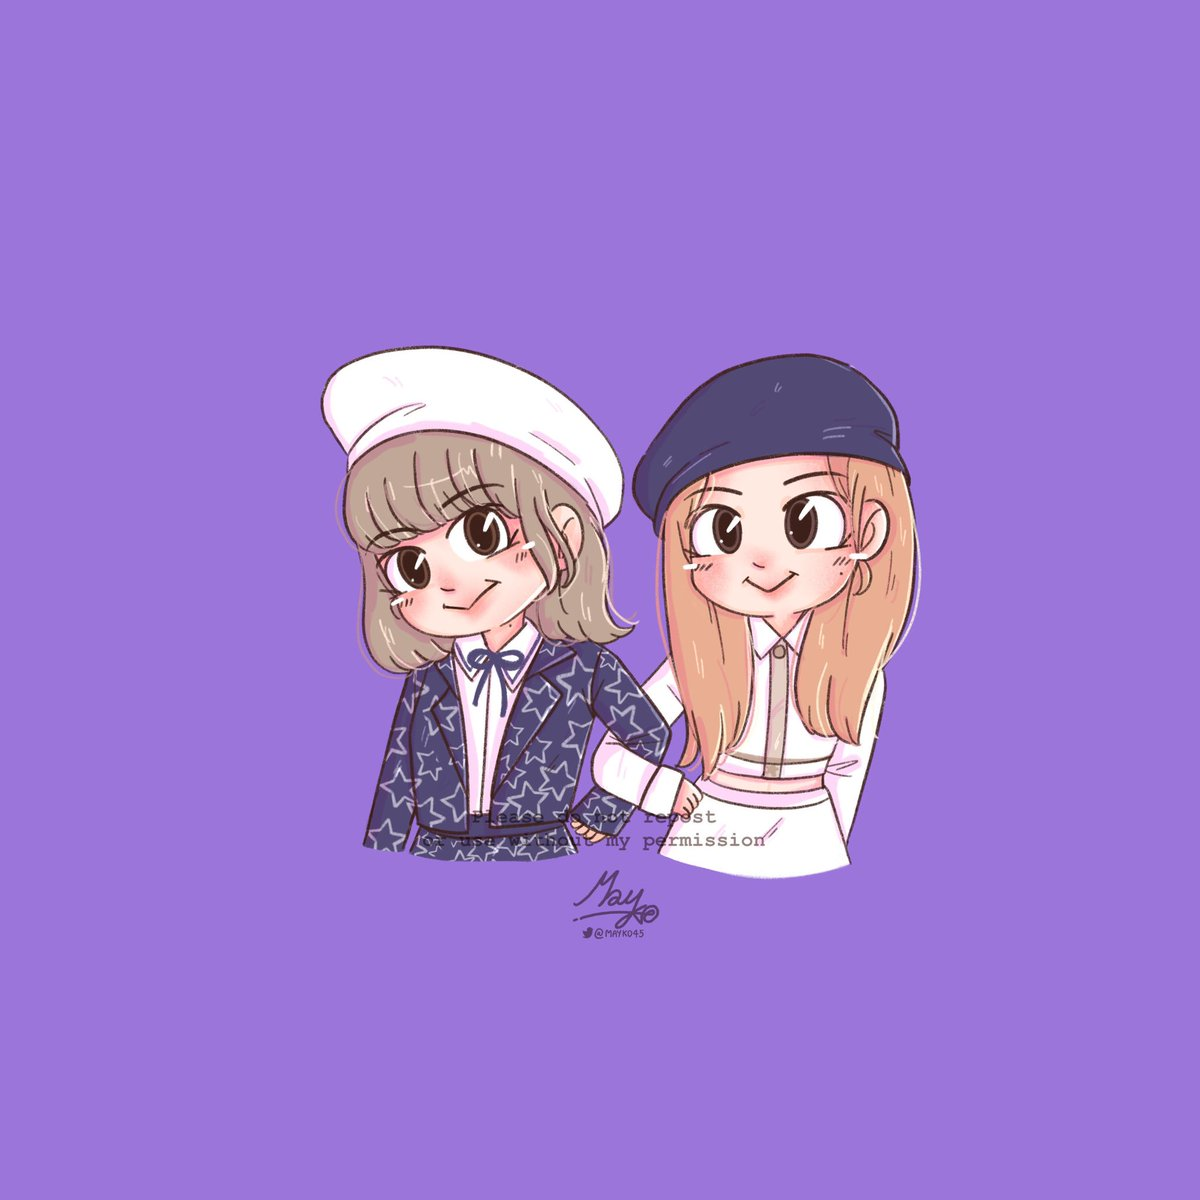 [FA] Little twin ;) #BlackpinkPrivateStage #Rose #LISA #lalisa #ChaeLisa #Mayko #KillThisLove for #TheMusicVideo on #PCAs @ygofficialblink